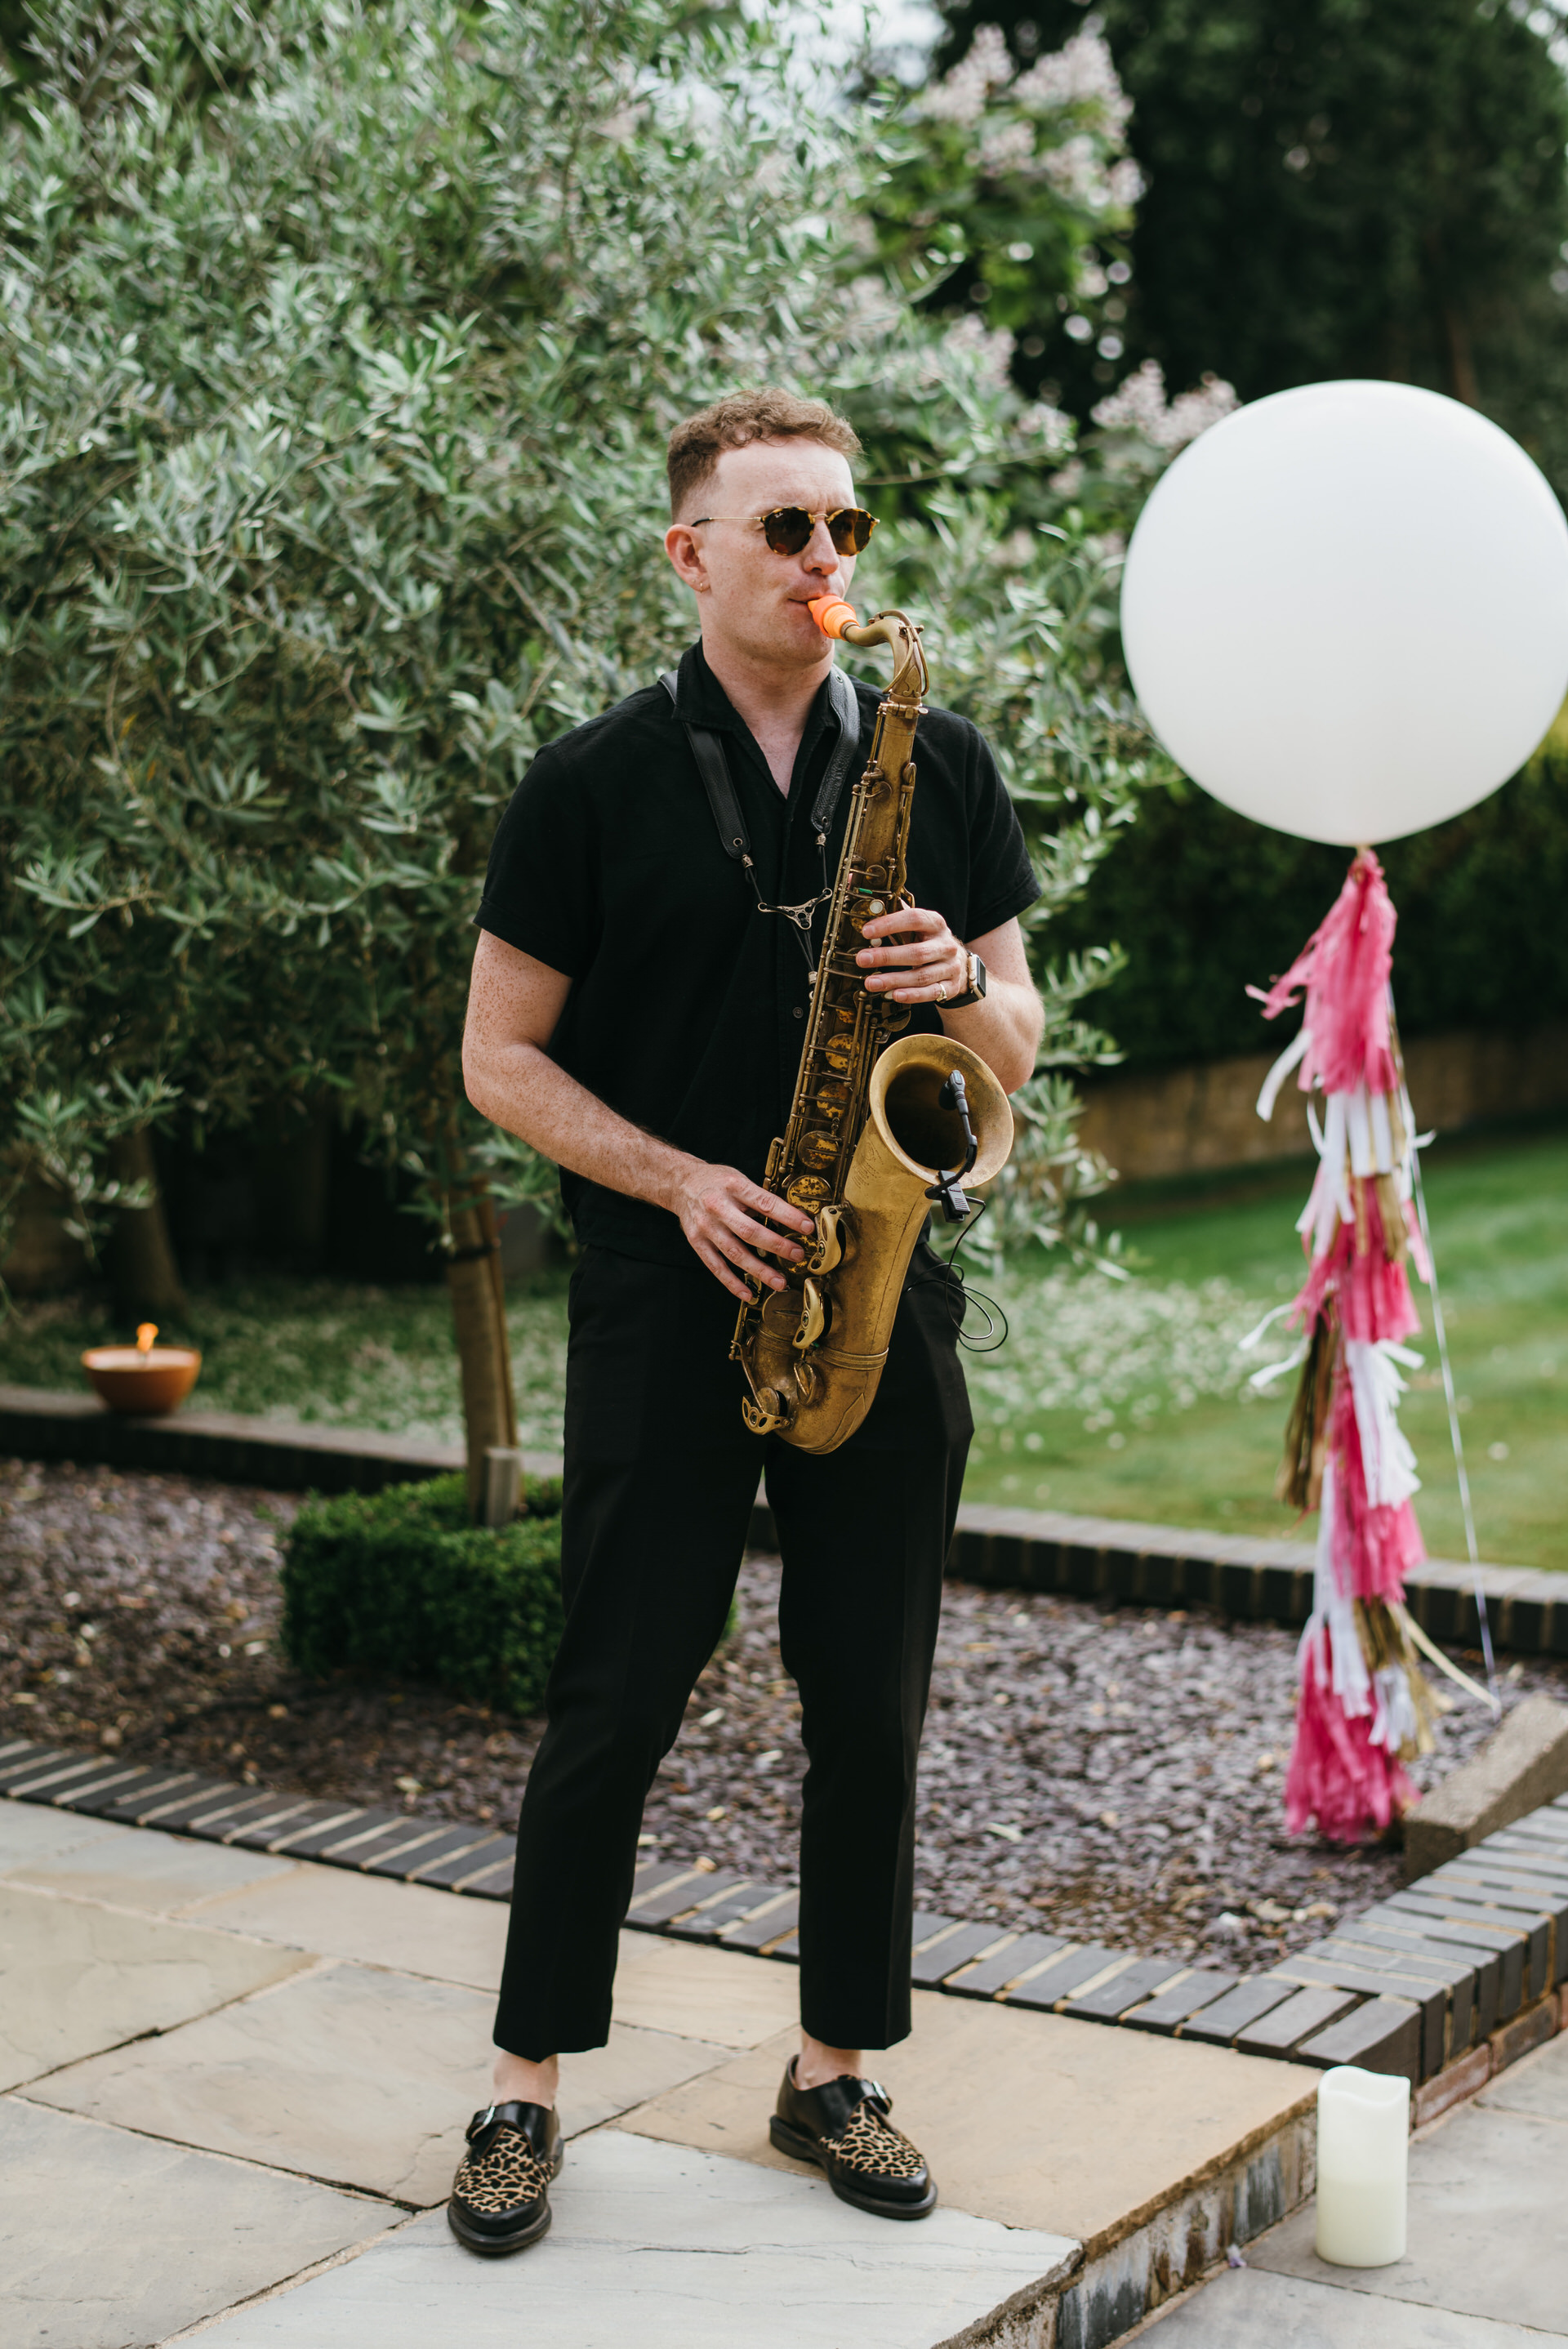 Saxophonist at wedding reception